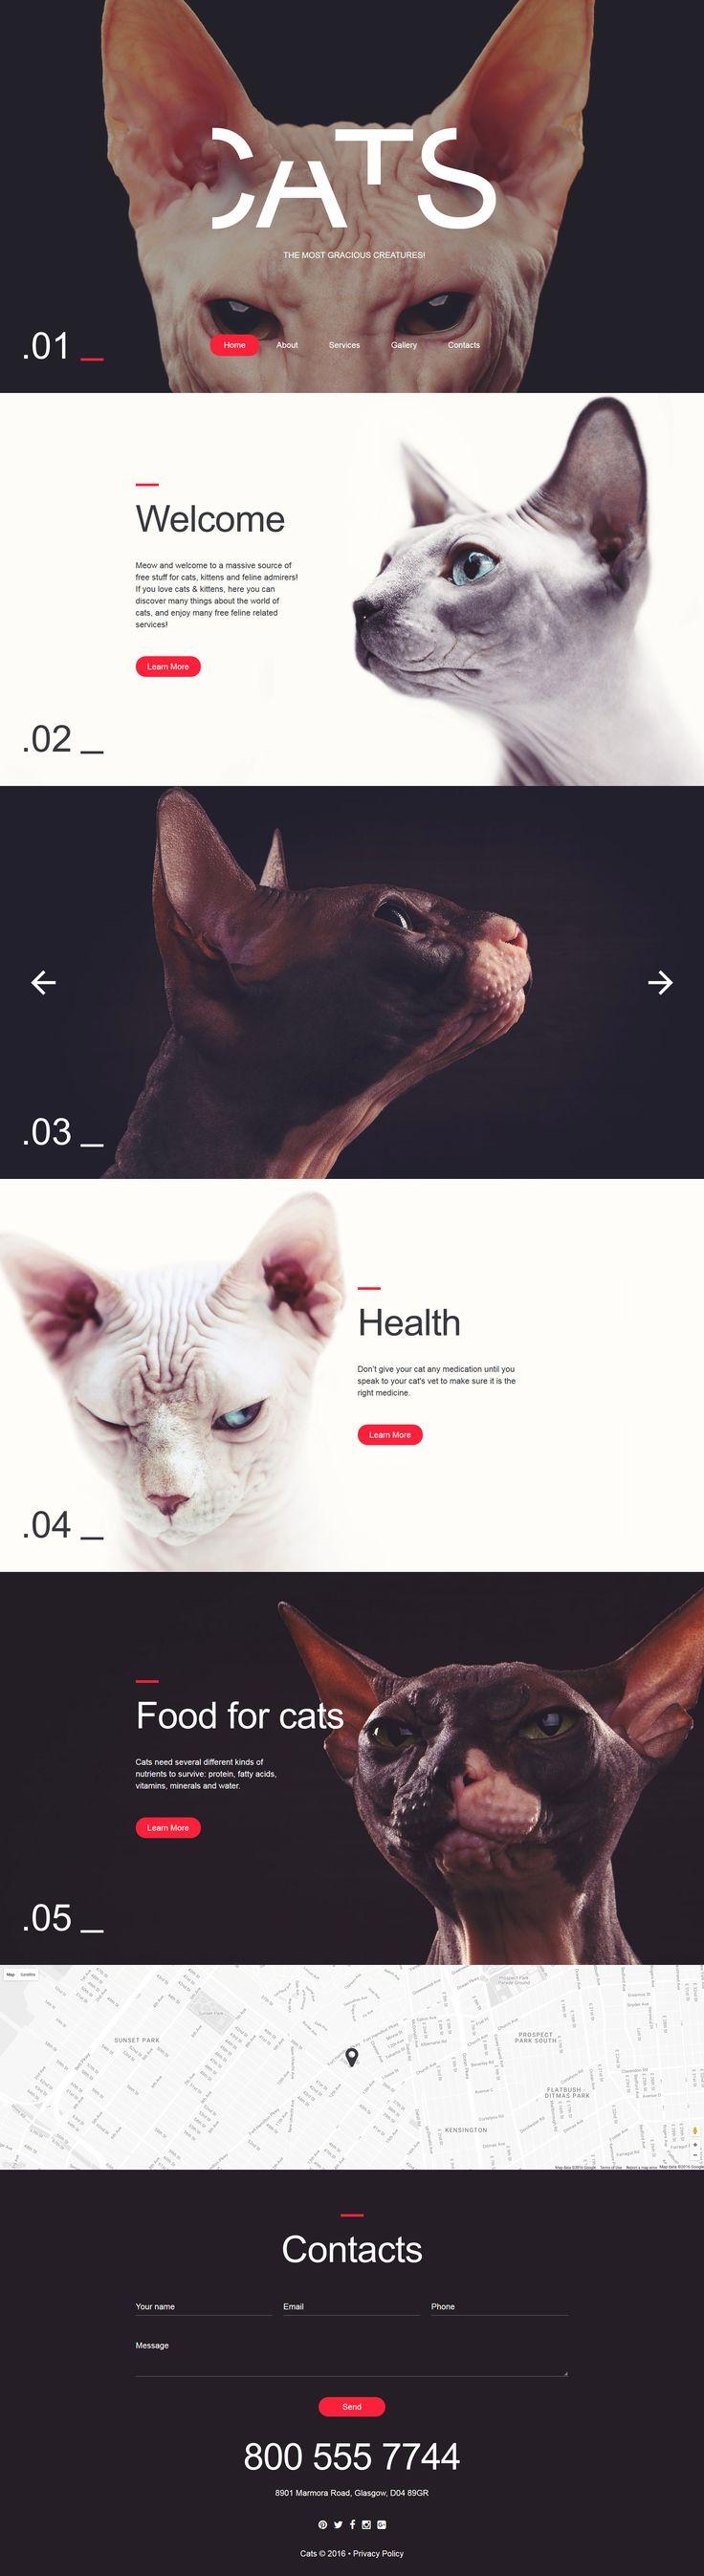 Cat Responsive Website Template http://www.templatemonster.com/website-templates/responsive-website-template-58052.html